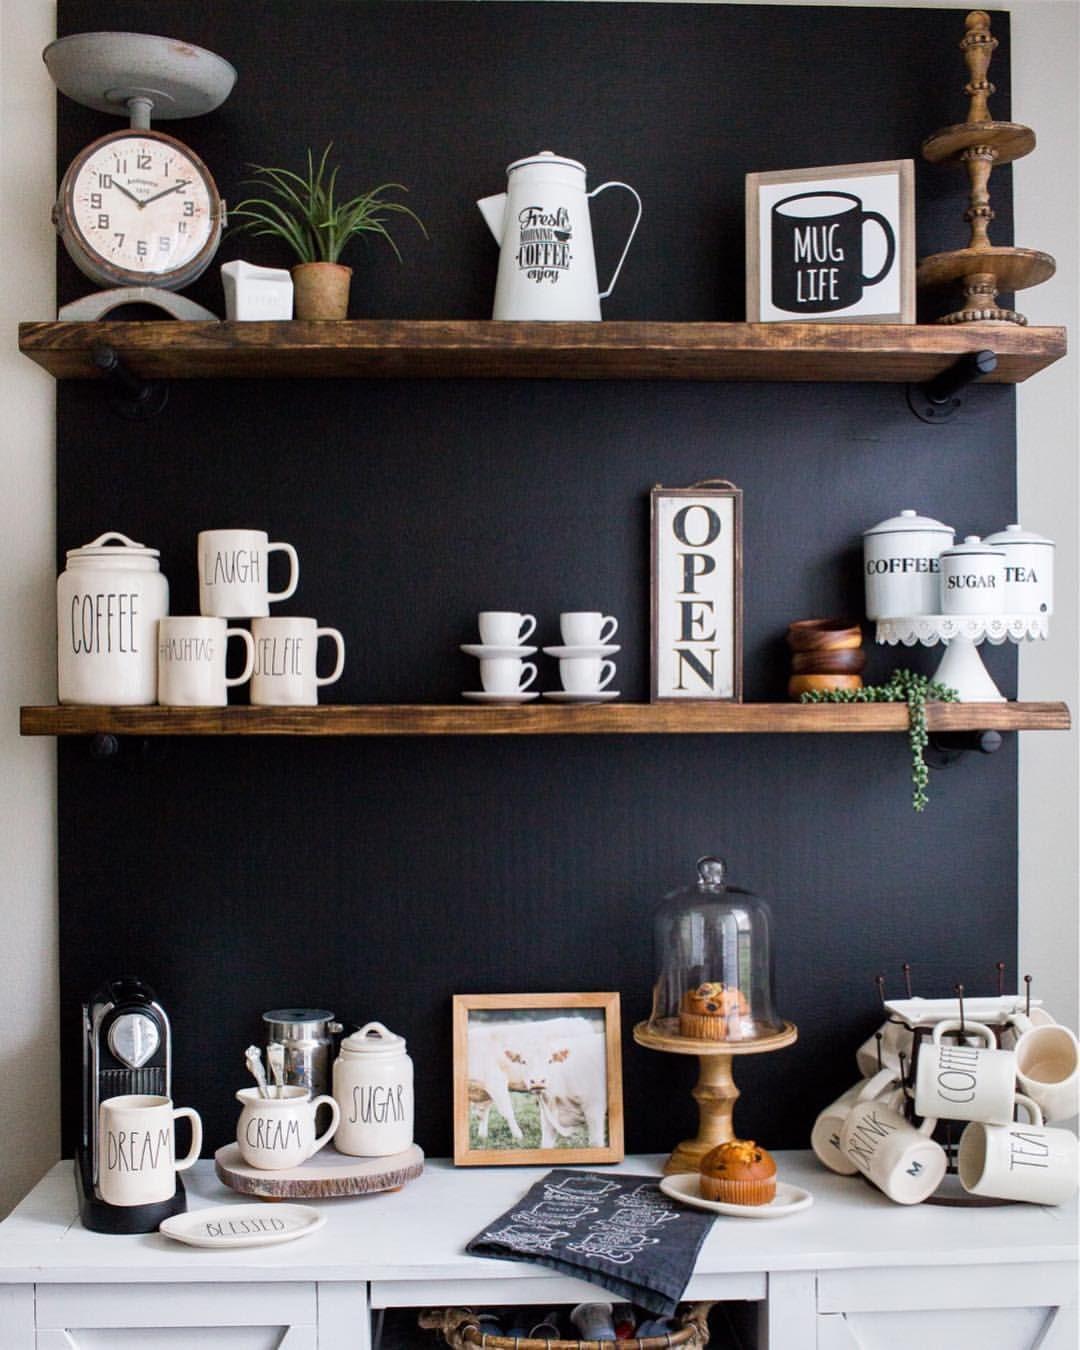 Coffee bar, coffee station, chalkboard wall, Rae Dunn